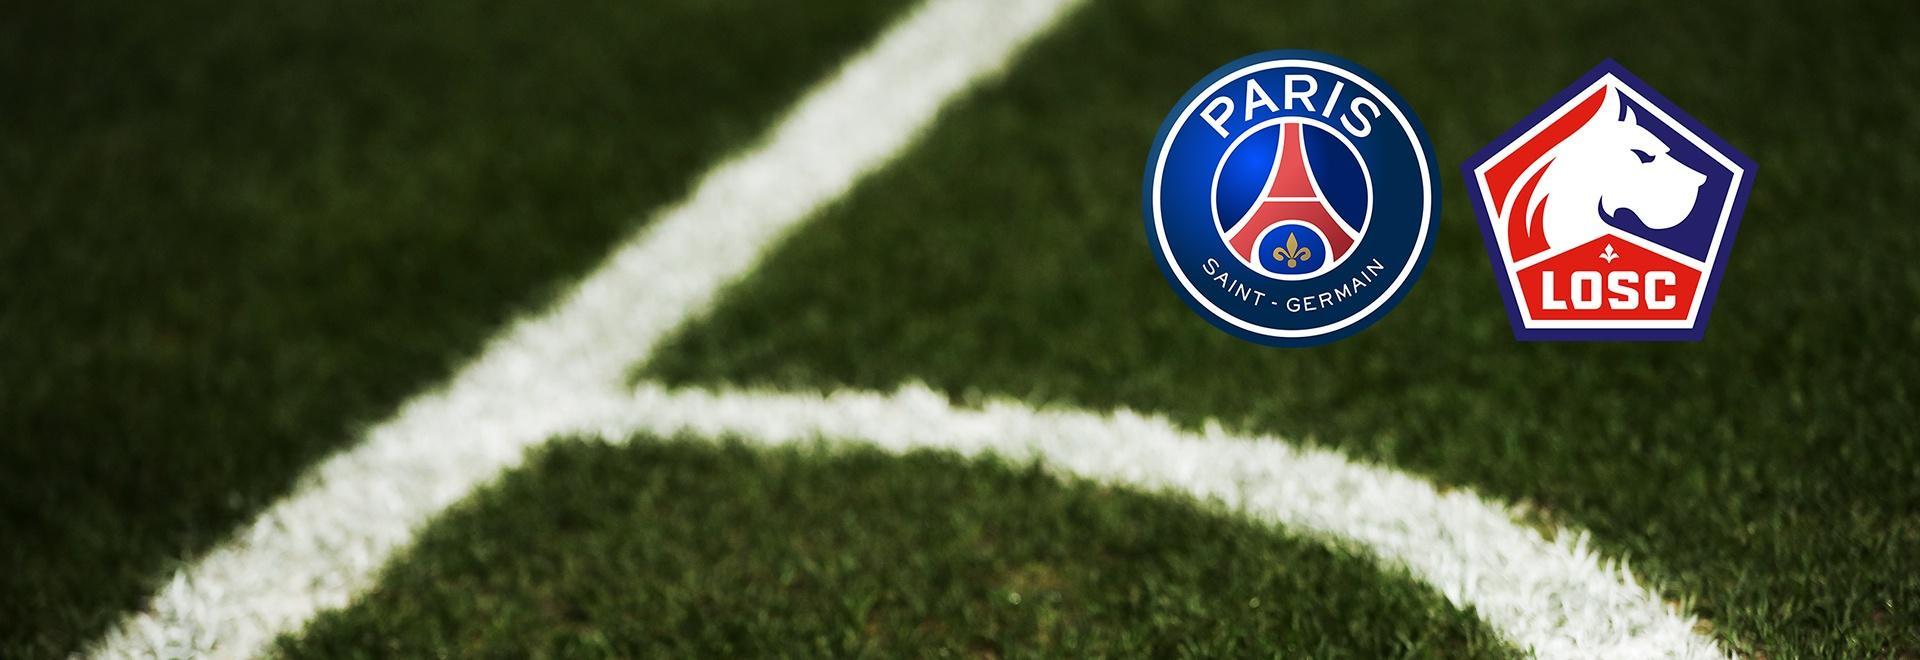 PSG - Lille. 14a g.